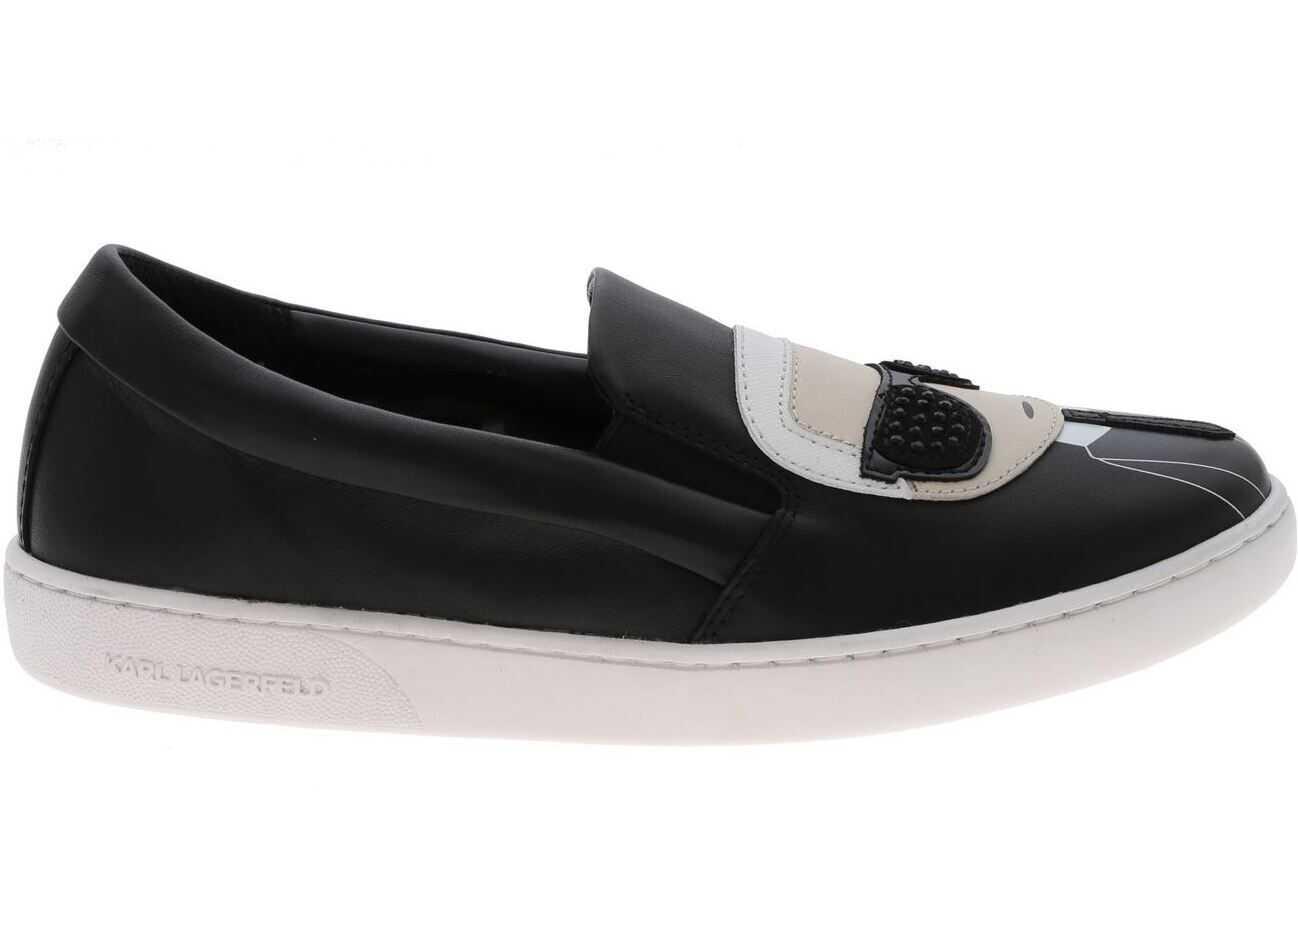 Karl Lagerfeld Kupsole Slip-On In Black KL61200 000 Black imagine b-mall.ro